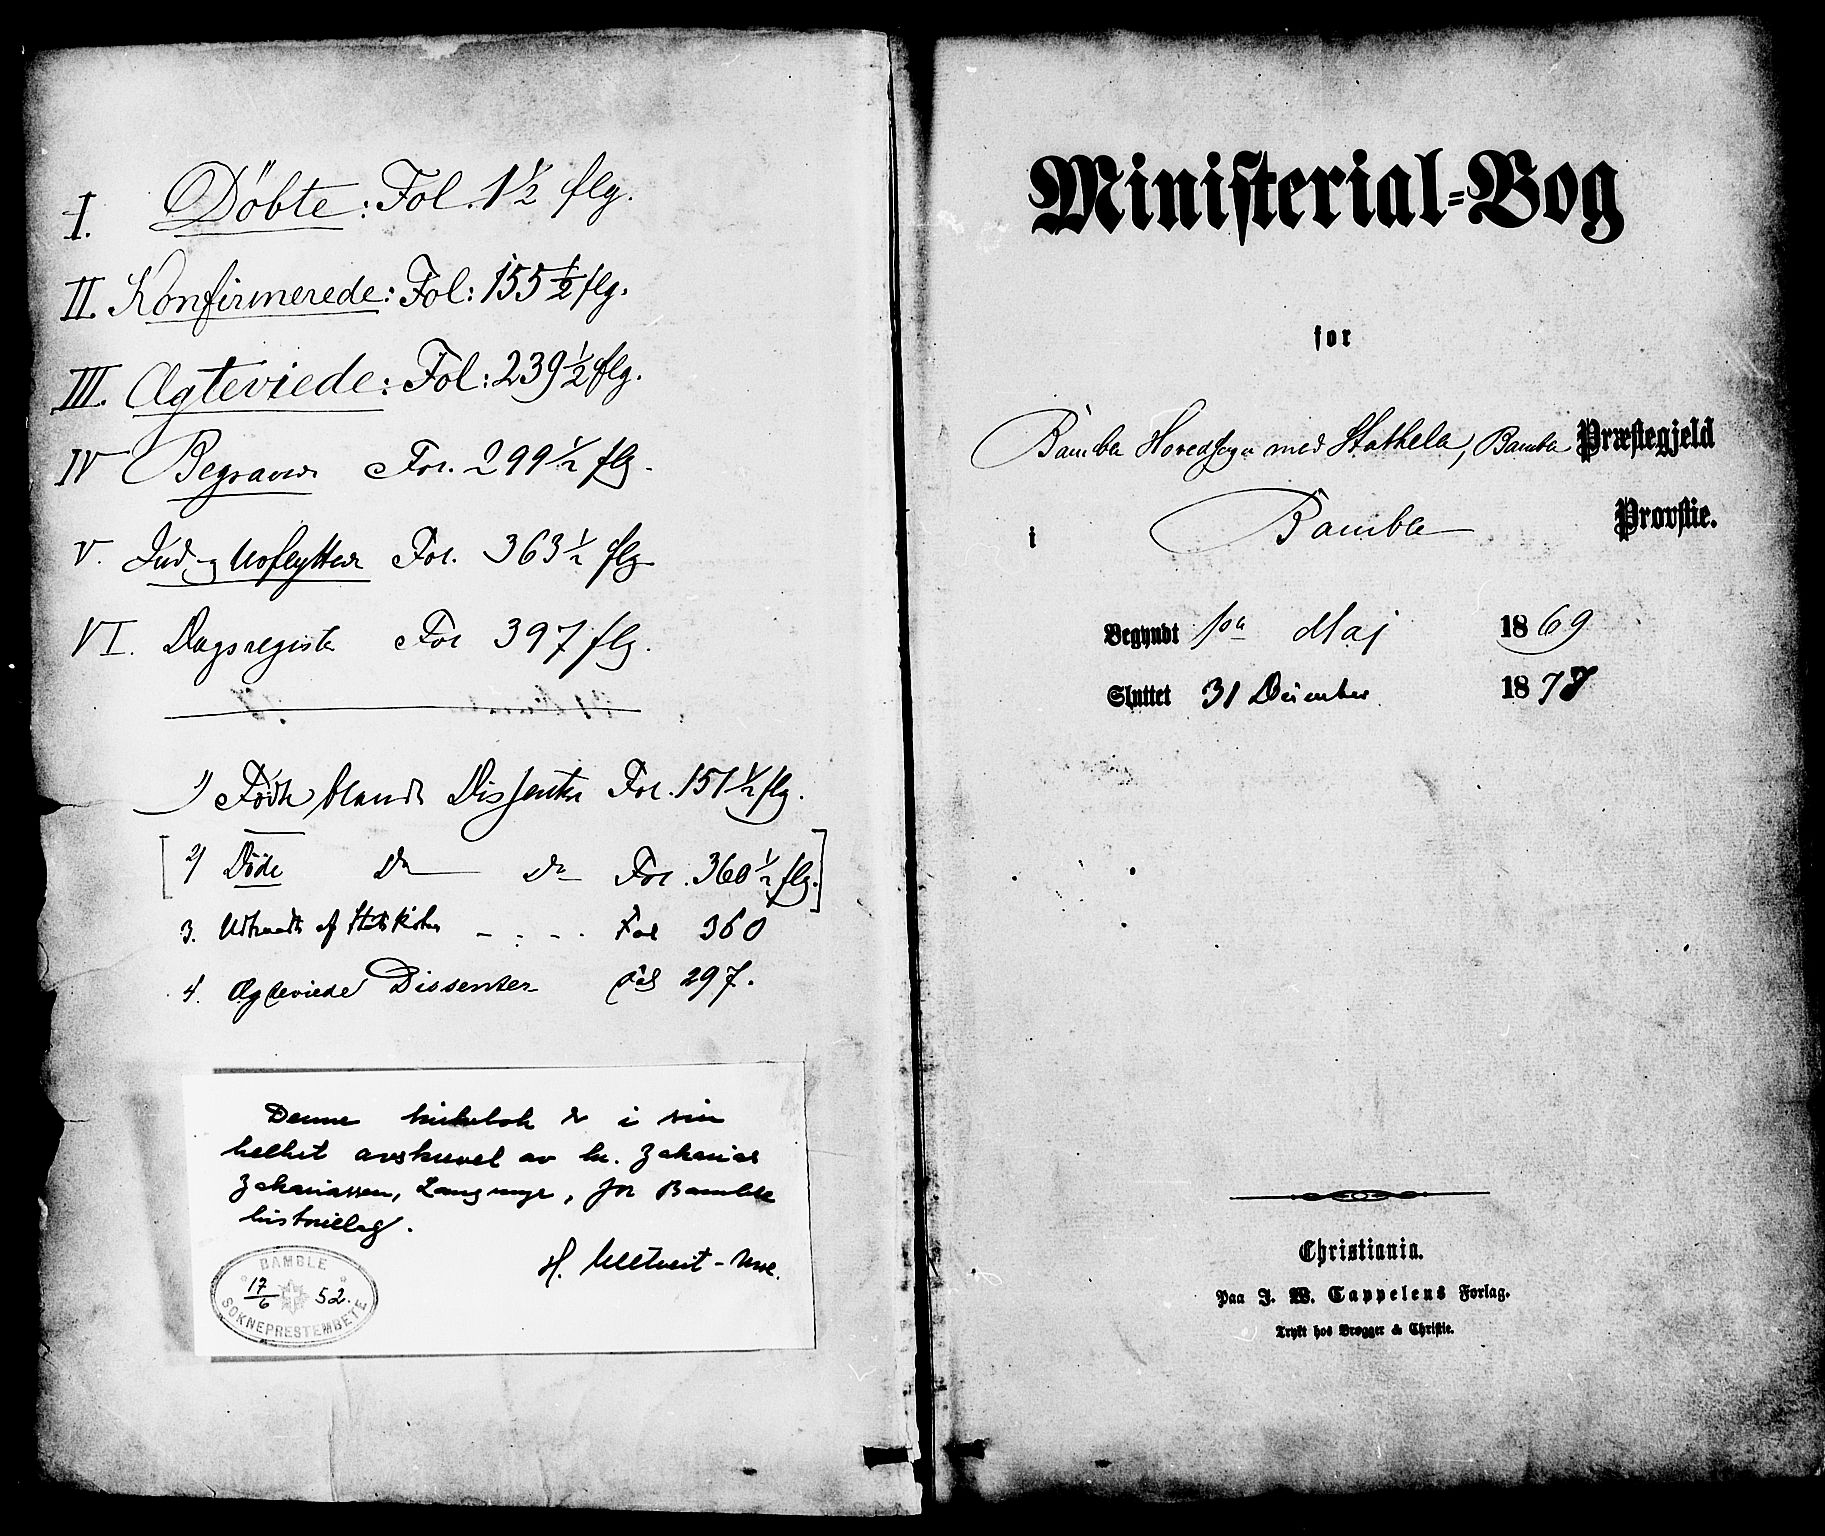 SAKO, Bamble kirkebøker, F/Fa/L0006: Ministerialbok nr. I 6, 1869-1877